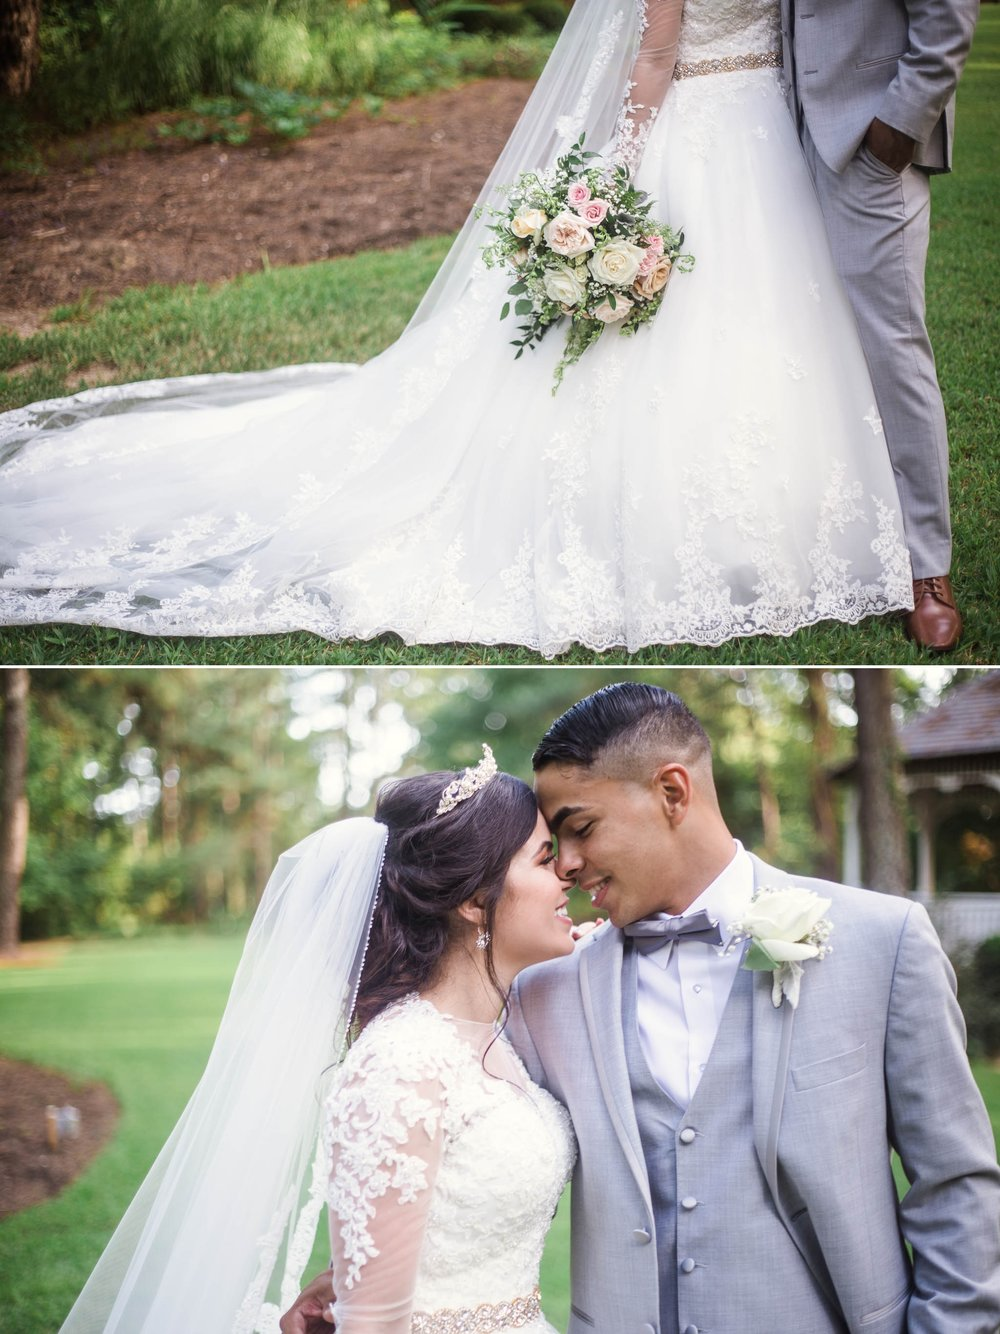 Portraits of Bride and Groom - Yansi + Eddie - Wedding at Cape Fear Botanical Garden - Fayetteville North Carolina Photographer